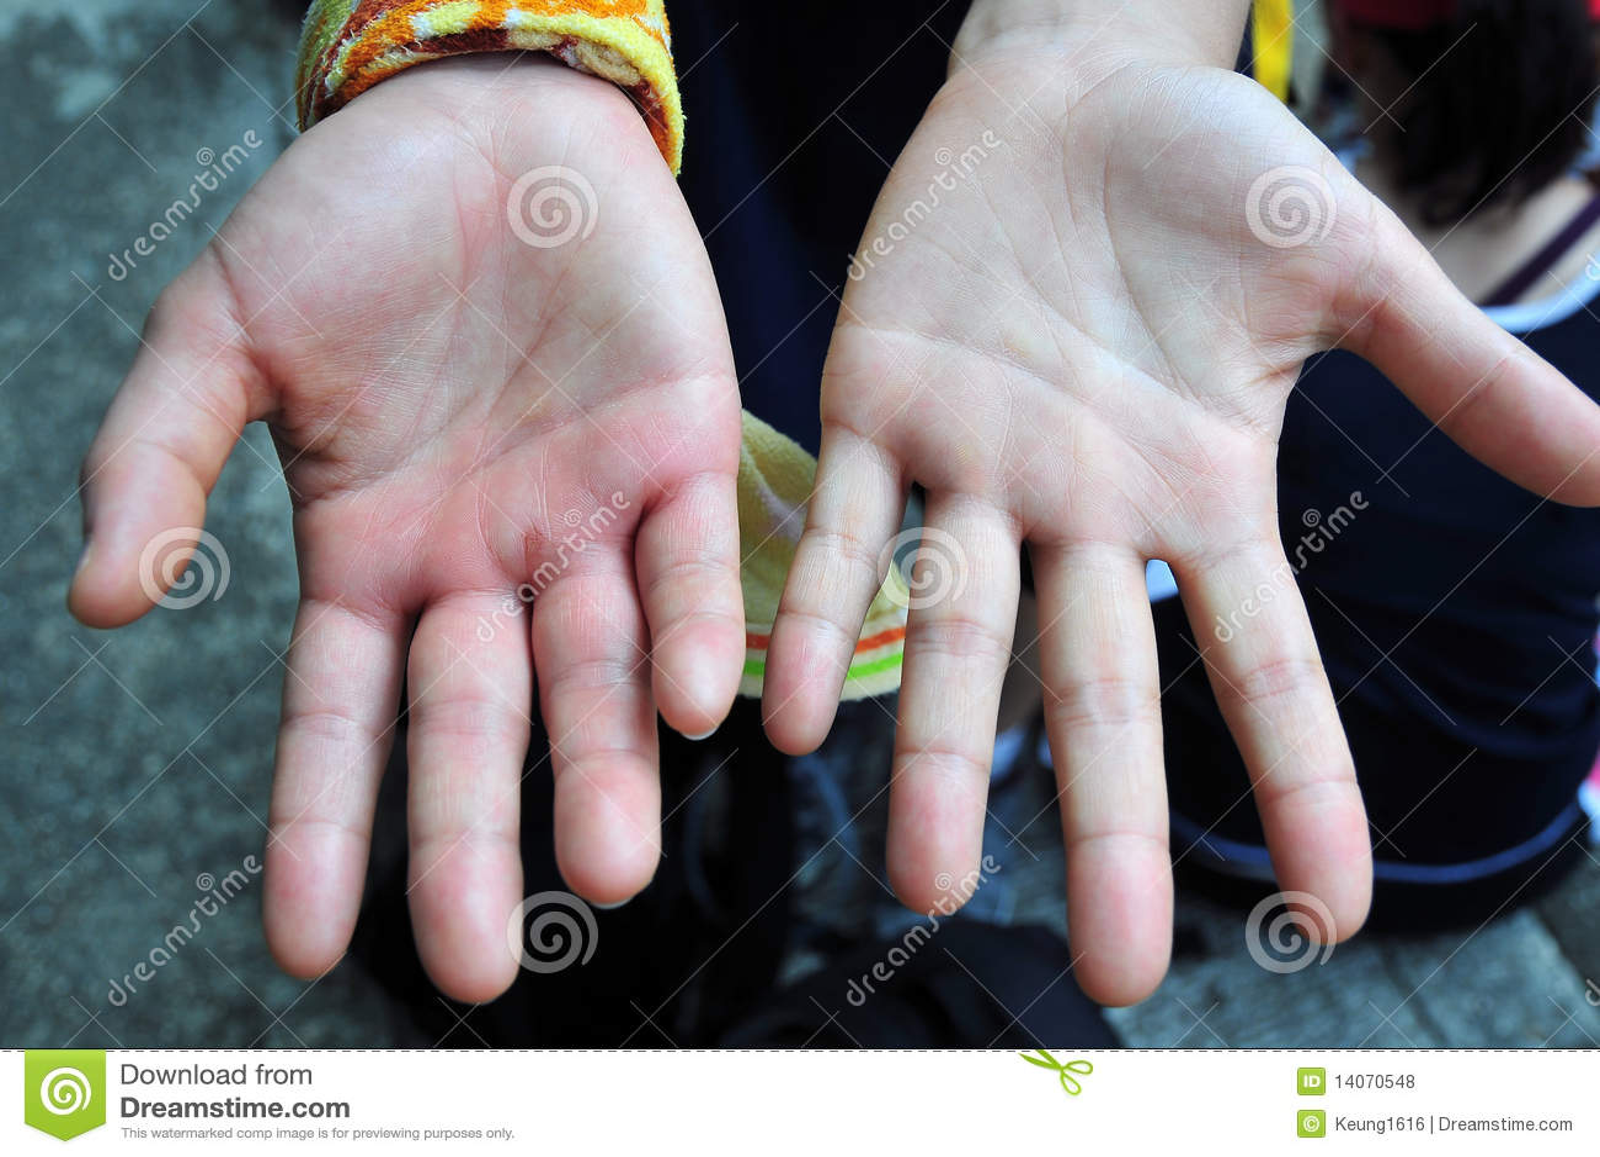 Swelling hand